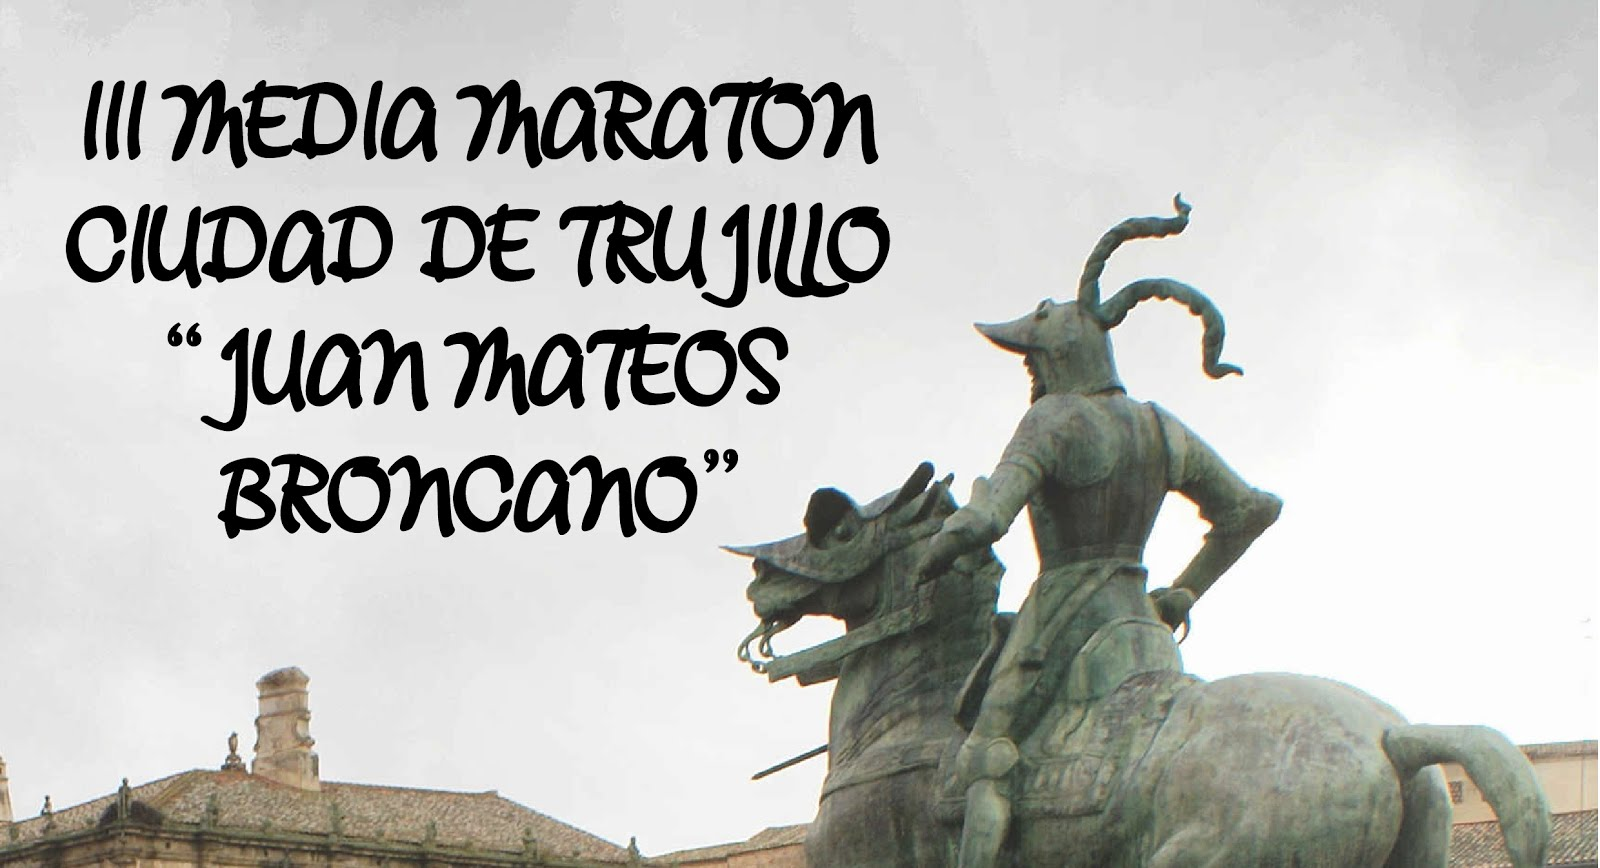 "III MEDIA MARATON CIUDAD DE TRUJILLO ""JUAN MATEOS BRONCANO"""